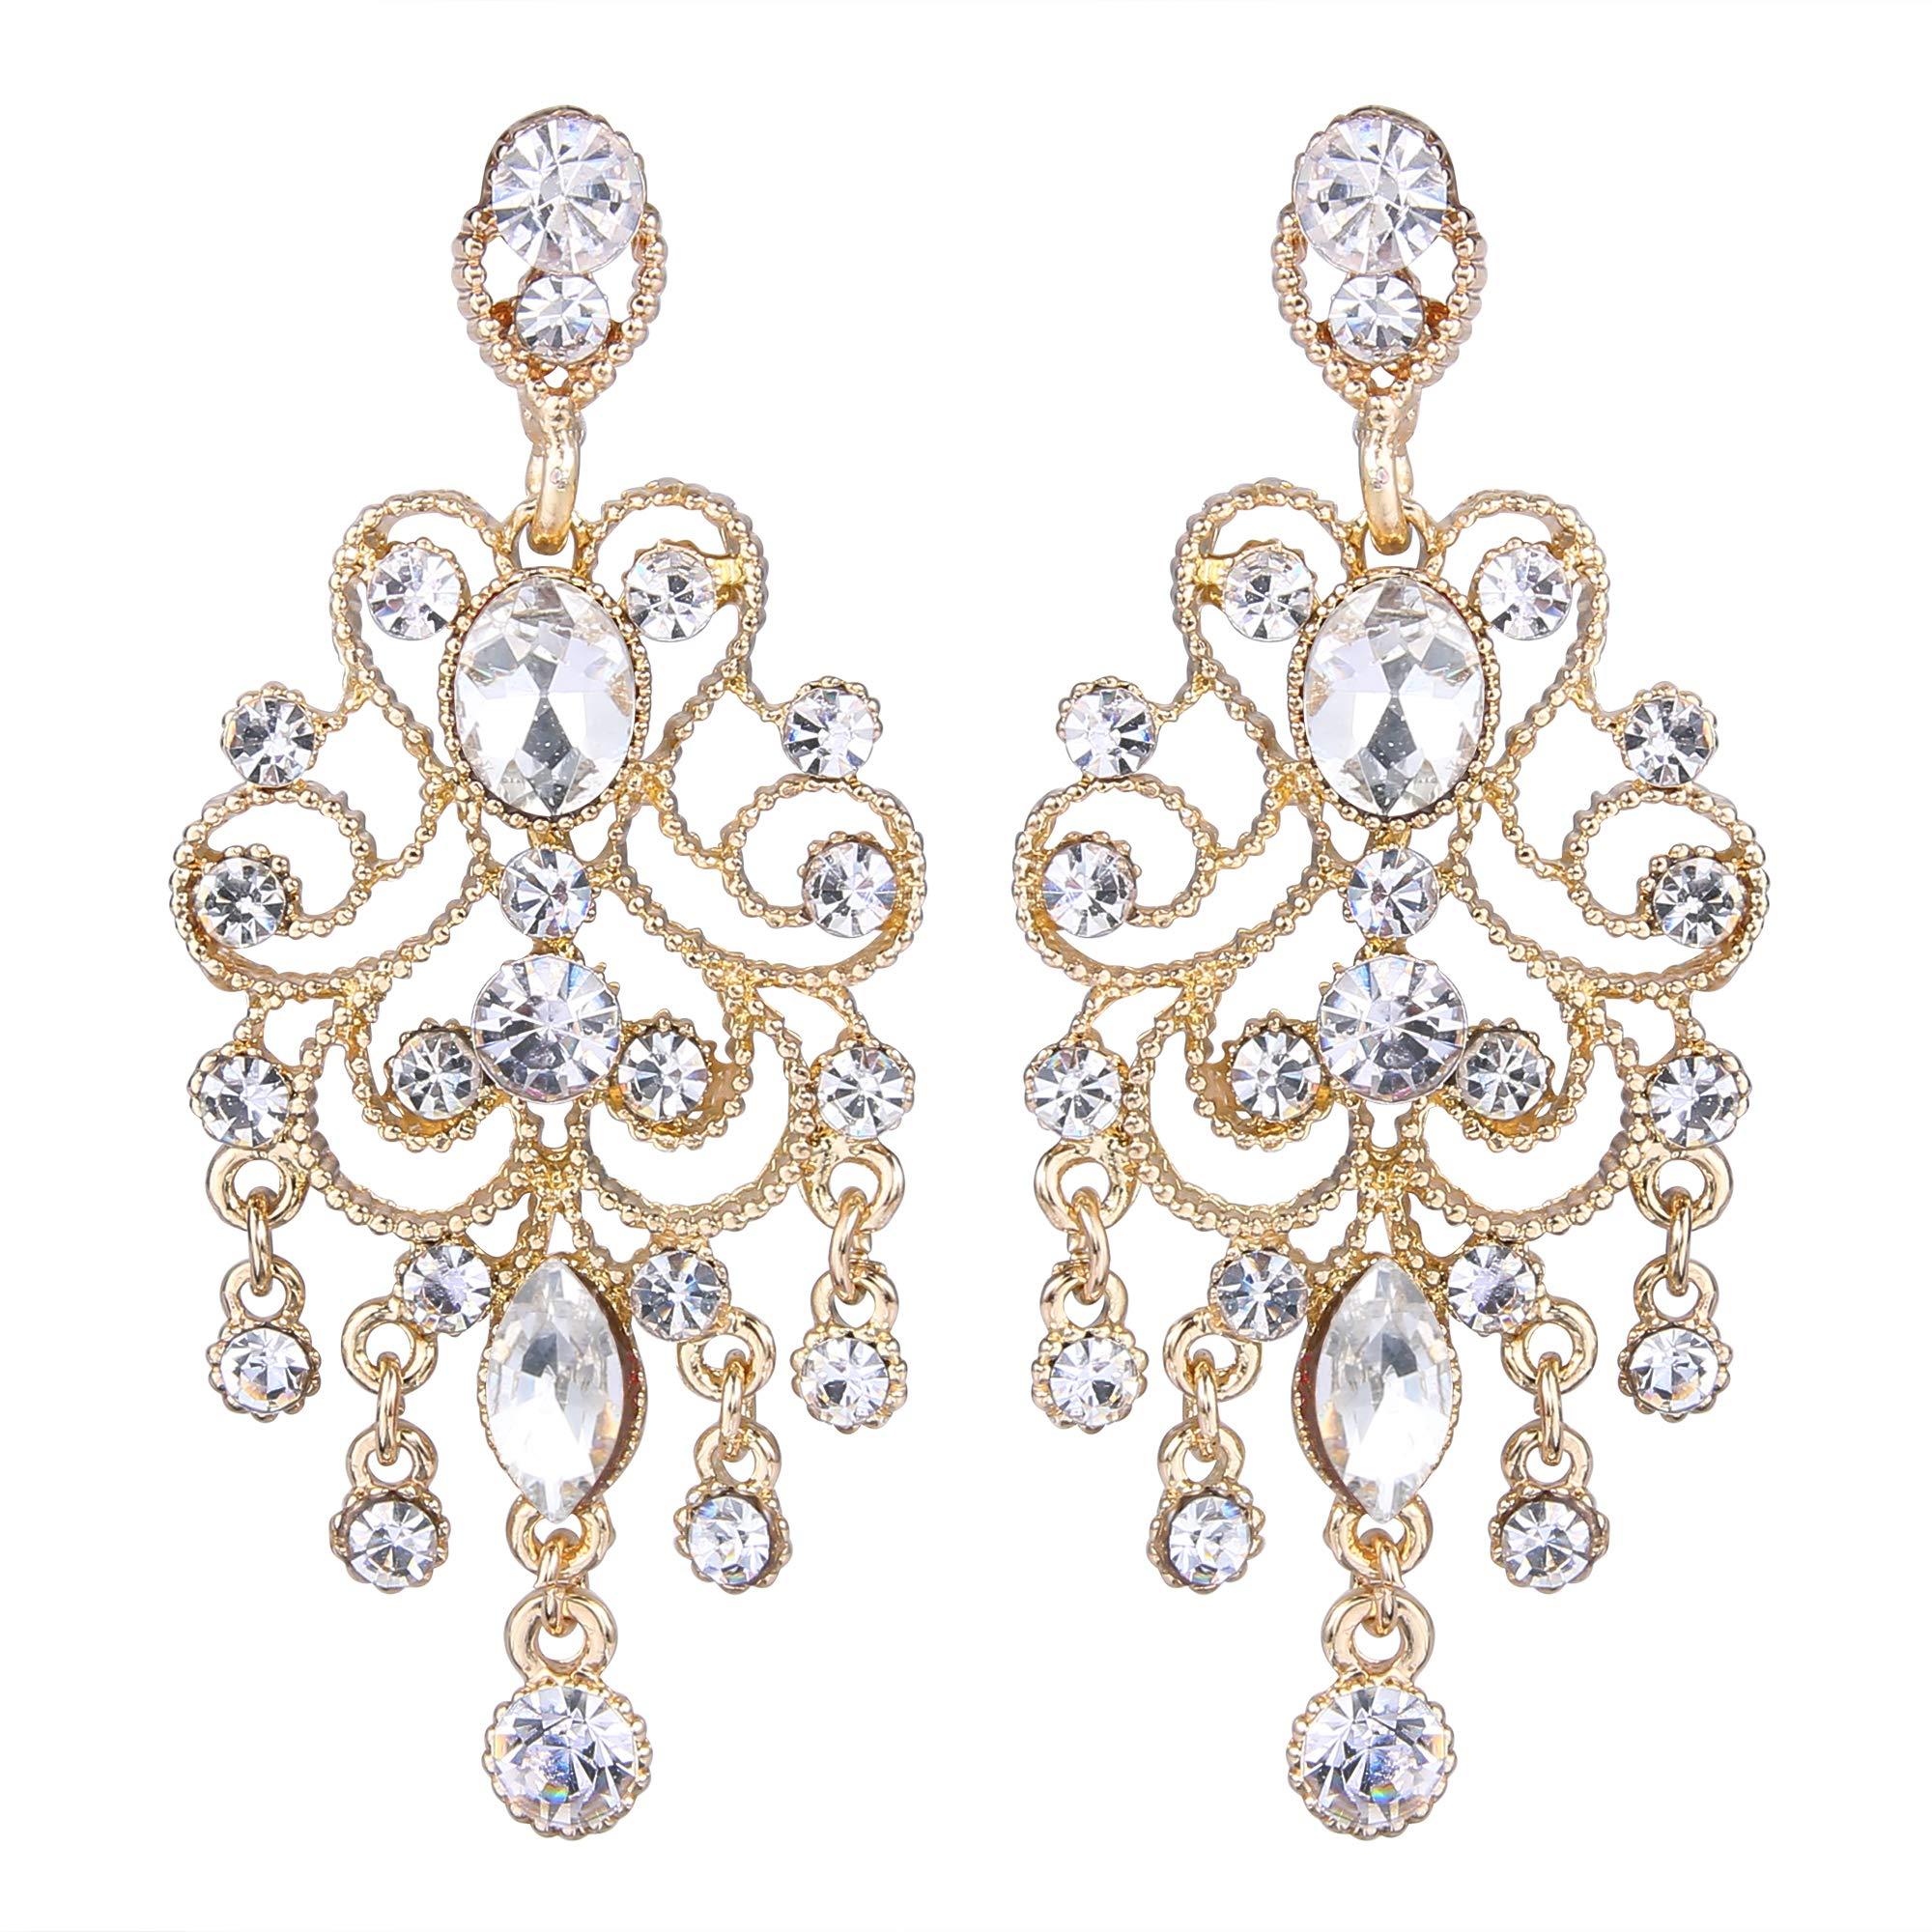 BriLove Gold-Toned Dangle Earrings for Women Vintage Style Bridal Crystal Drop Hollow Filigree Chandelier Earrings Clear